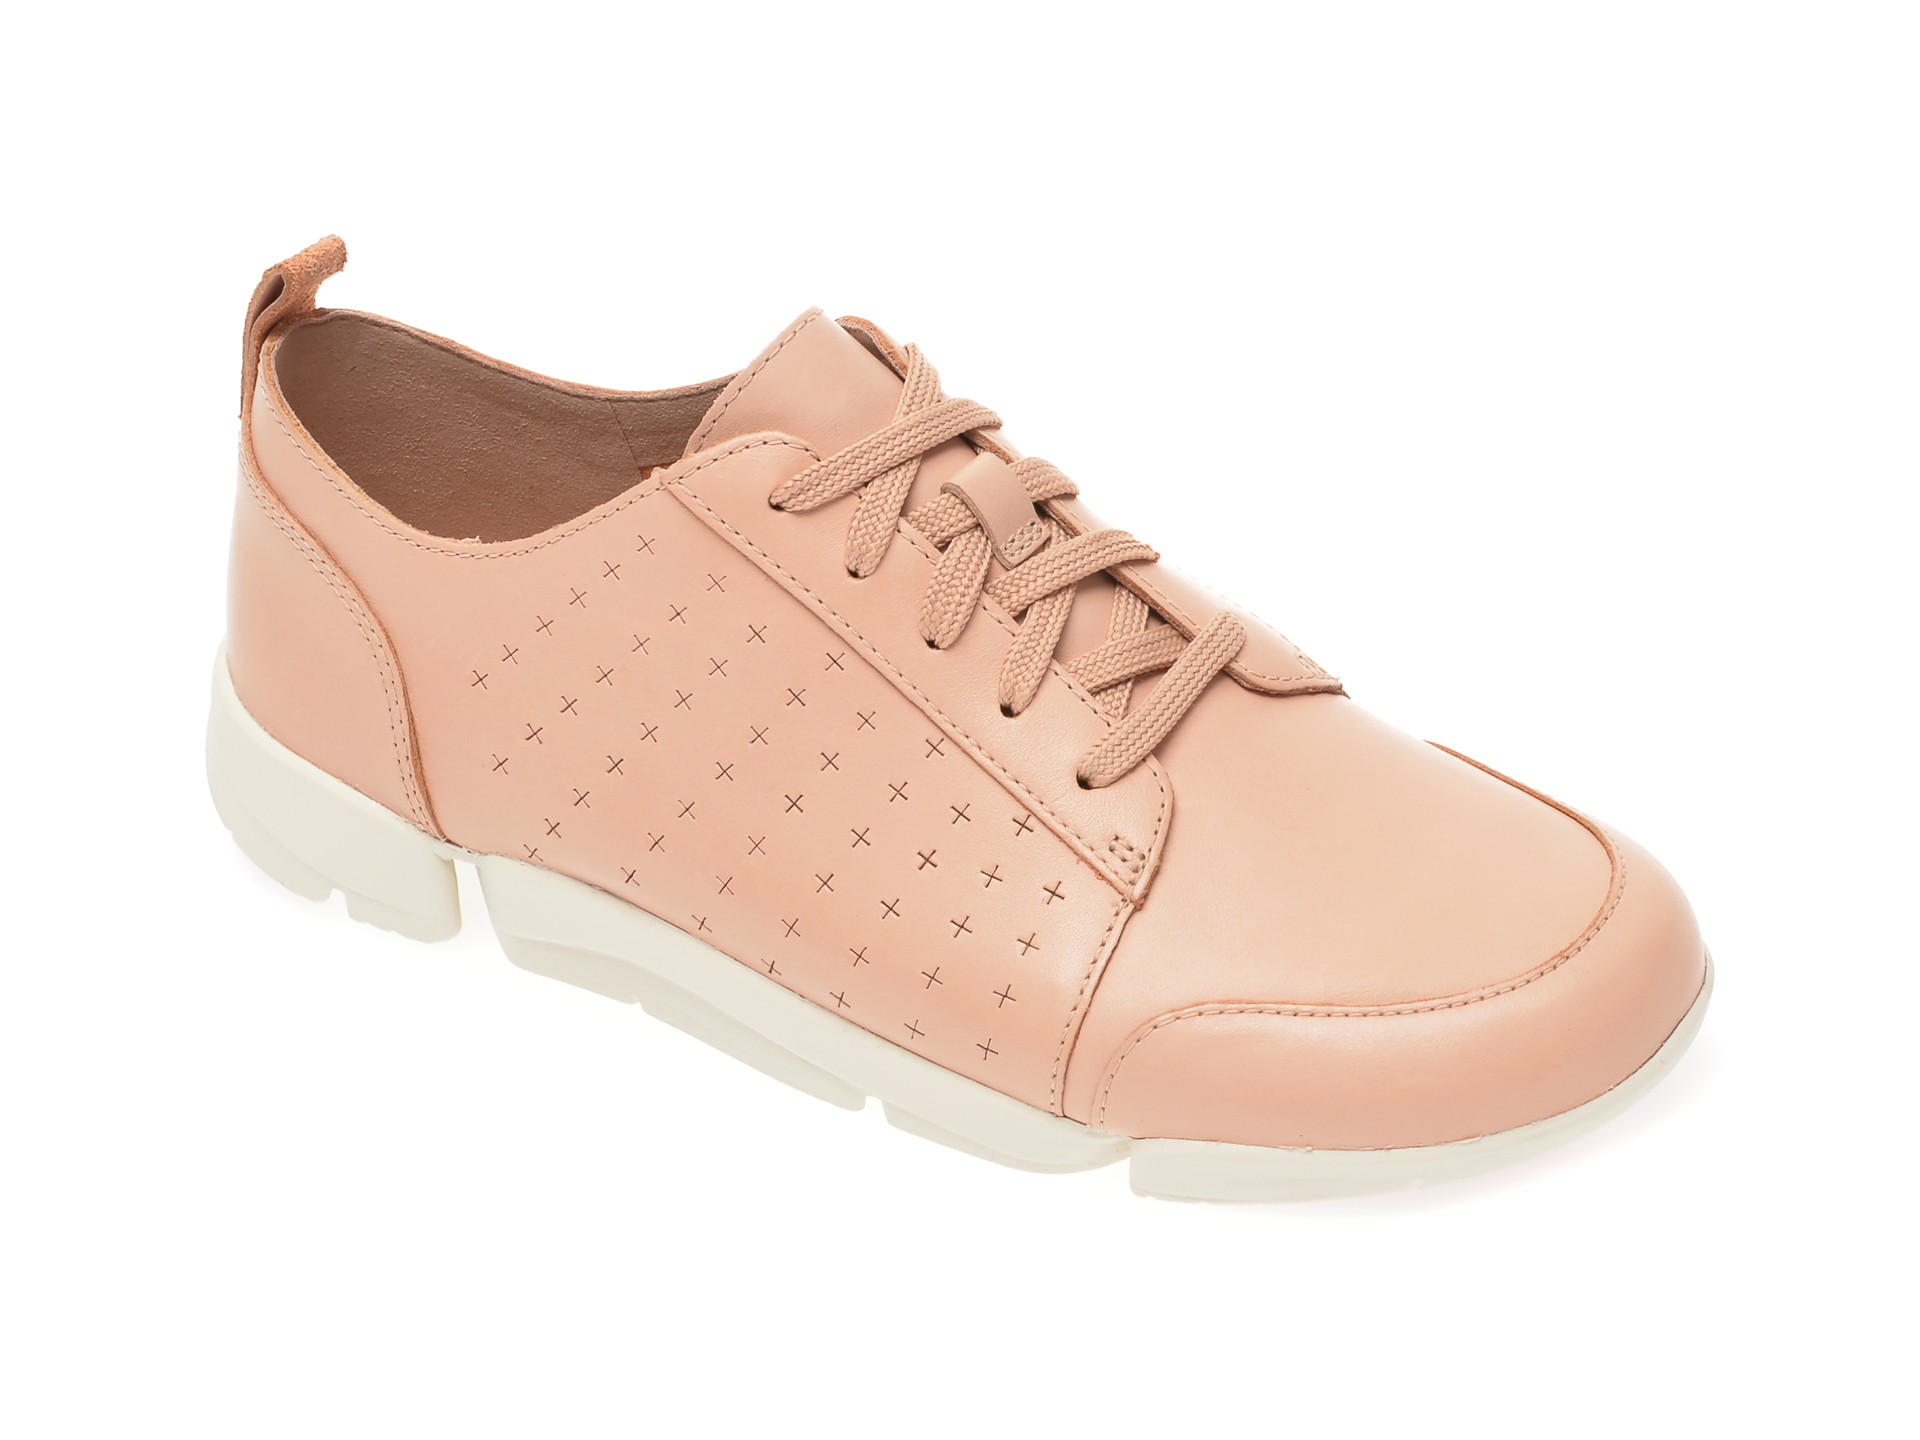 Pantofi vara CLARKS nude, Un Rio Tie, din piele naturala